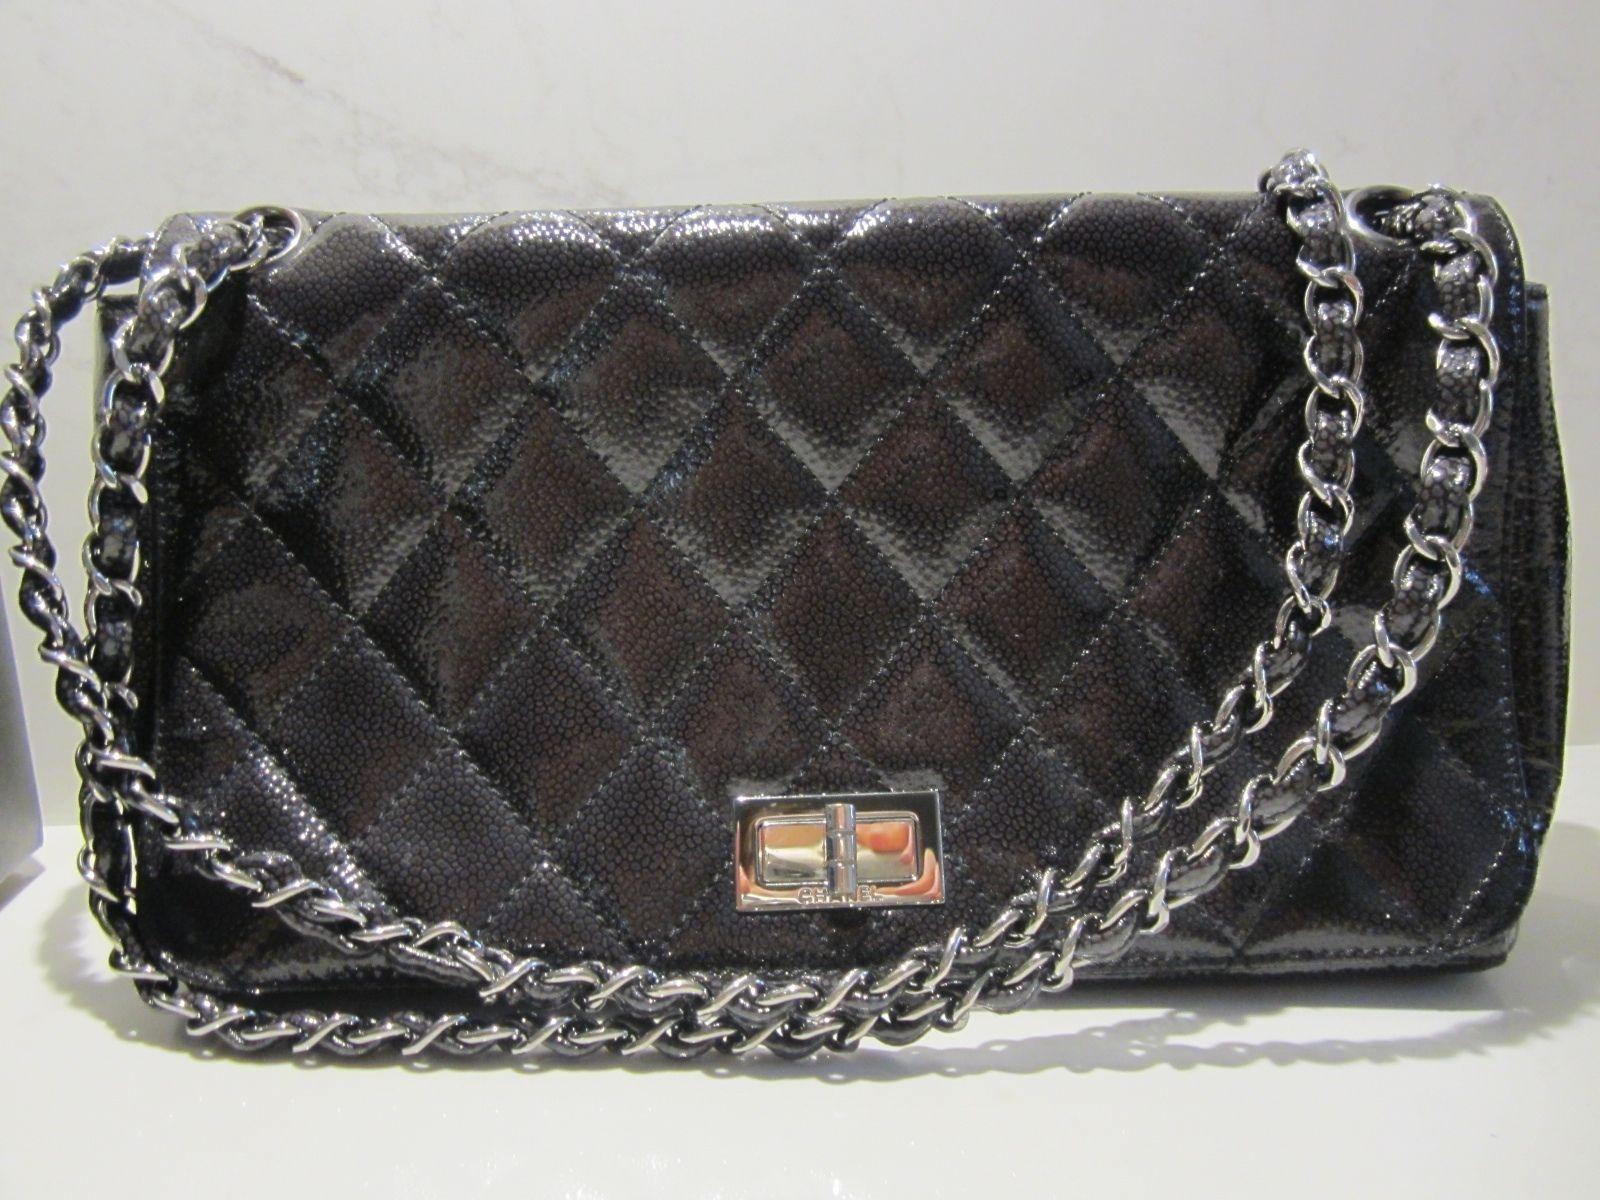 CHANEL 100% Authentic Black Coated Medium Caviar Flap Bag Mademoiselle Clasp https://t.co/E5HCM9vJBi https://t.co/2xz4siHXnS